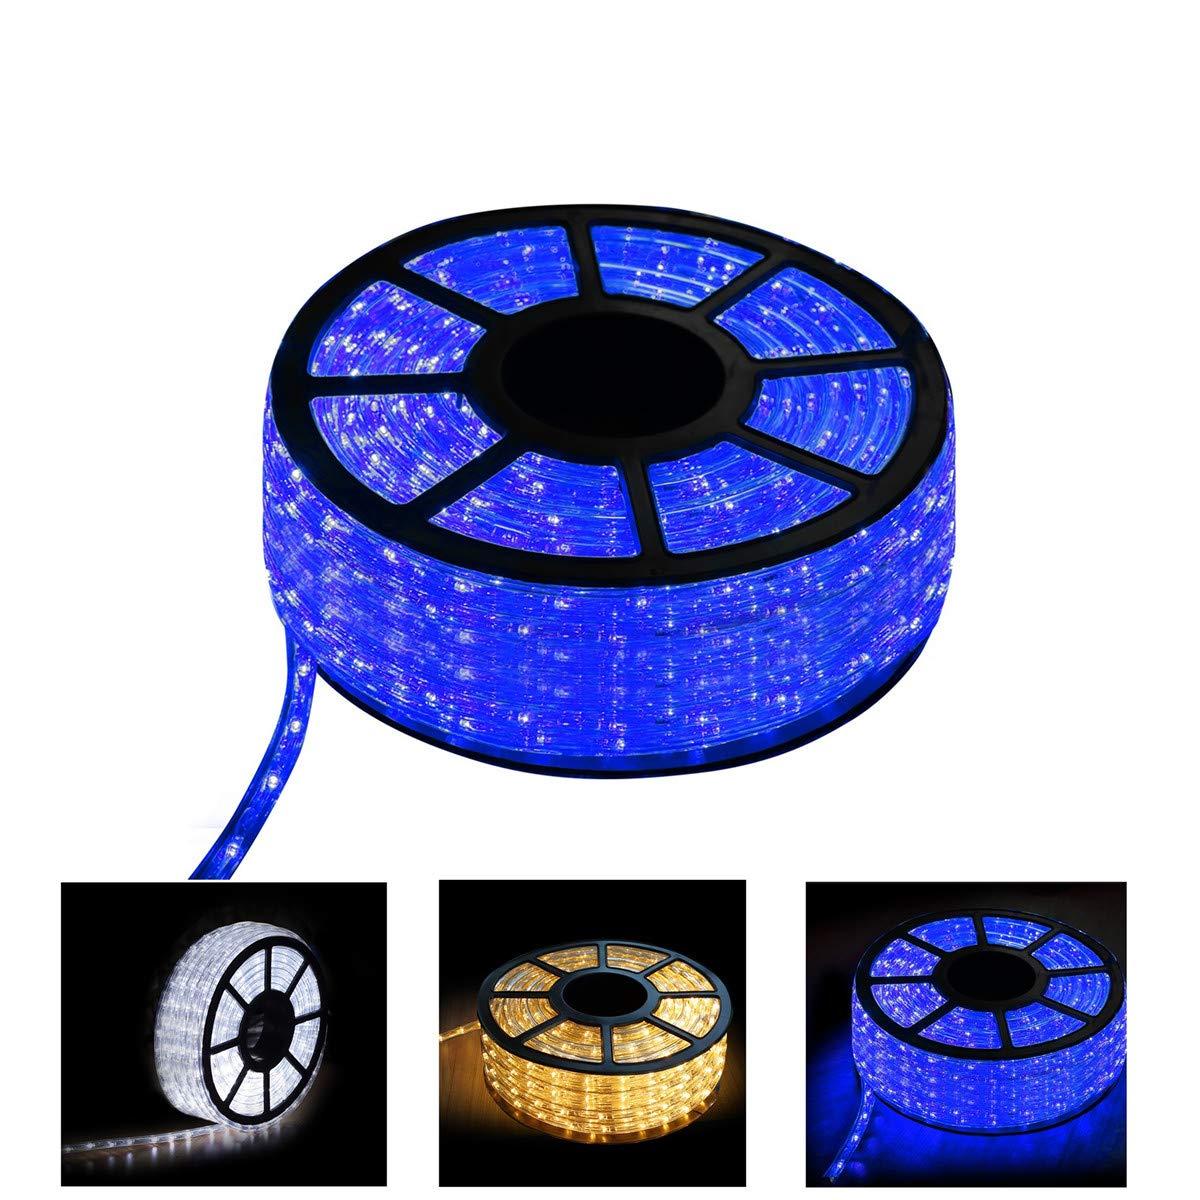 GREARDEN LED Rope Lights, 150FT 45M 110V 1620LEDs Waterproof Led Strip Lights for Party Christmas Home Kitchen Bedroom Room Indoor Outdoor Decoration (Blue, 150)